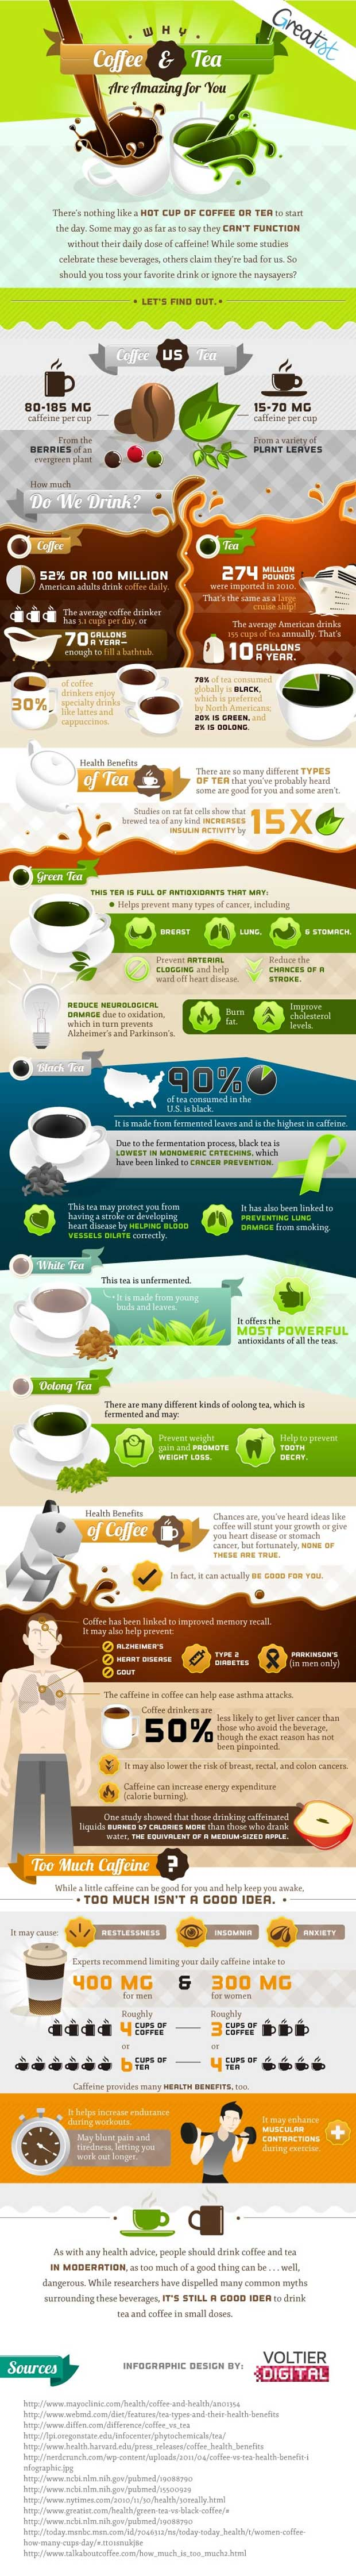 coffee-tea-benefits